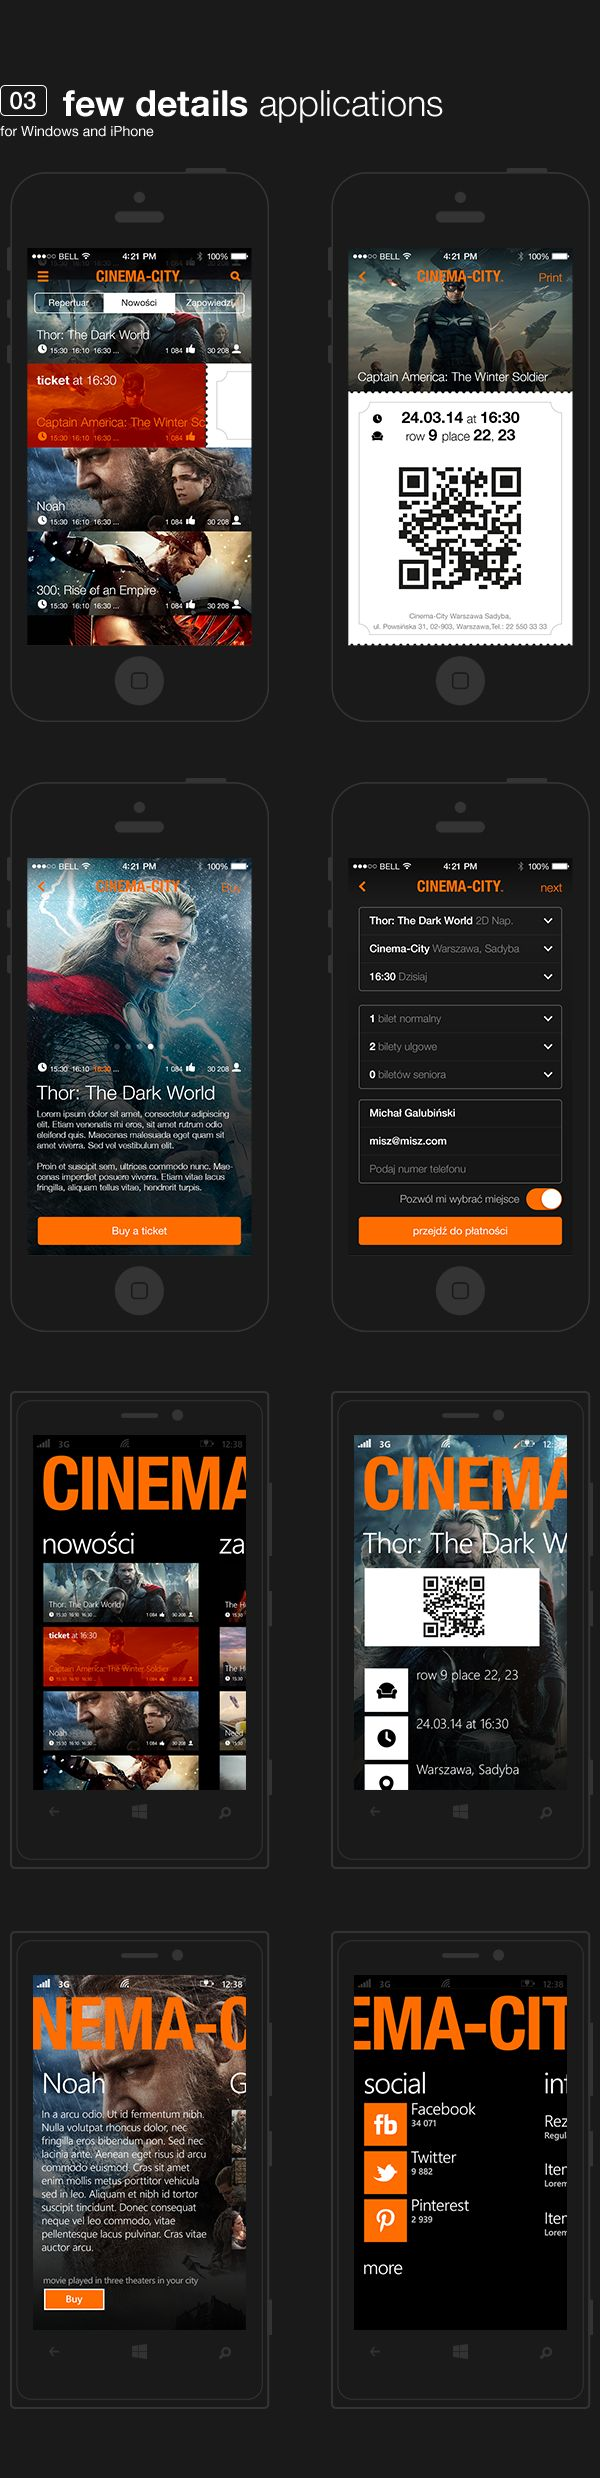 Cinema-City concept app by Michal Galubinski | iOS, Android, Windows